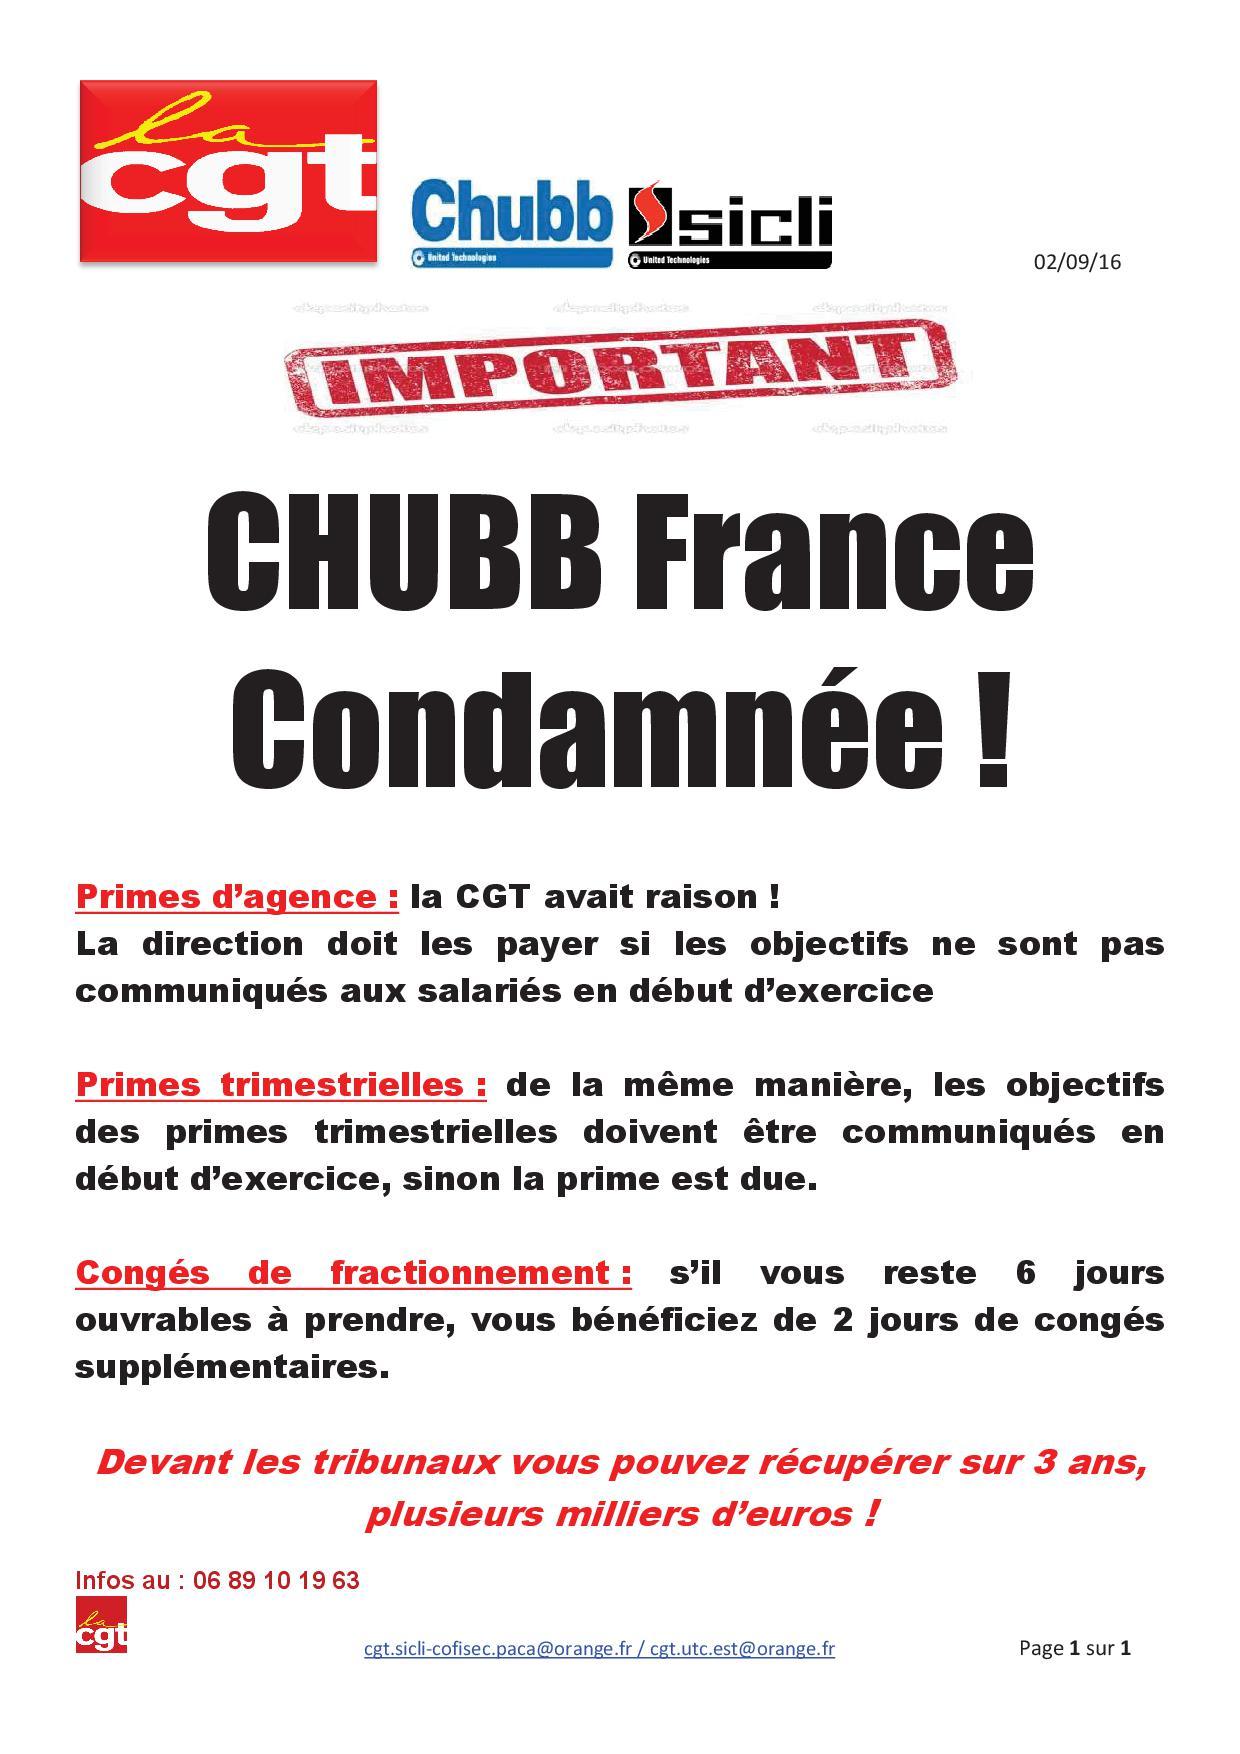 Chubb france condamnee